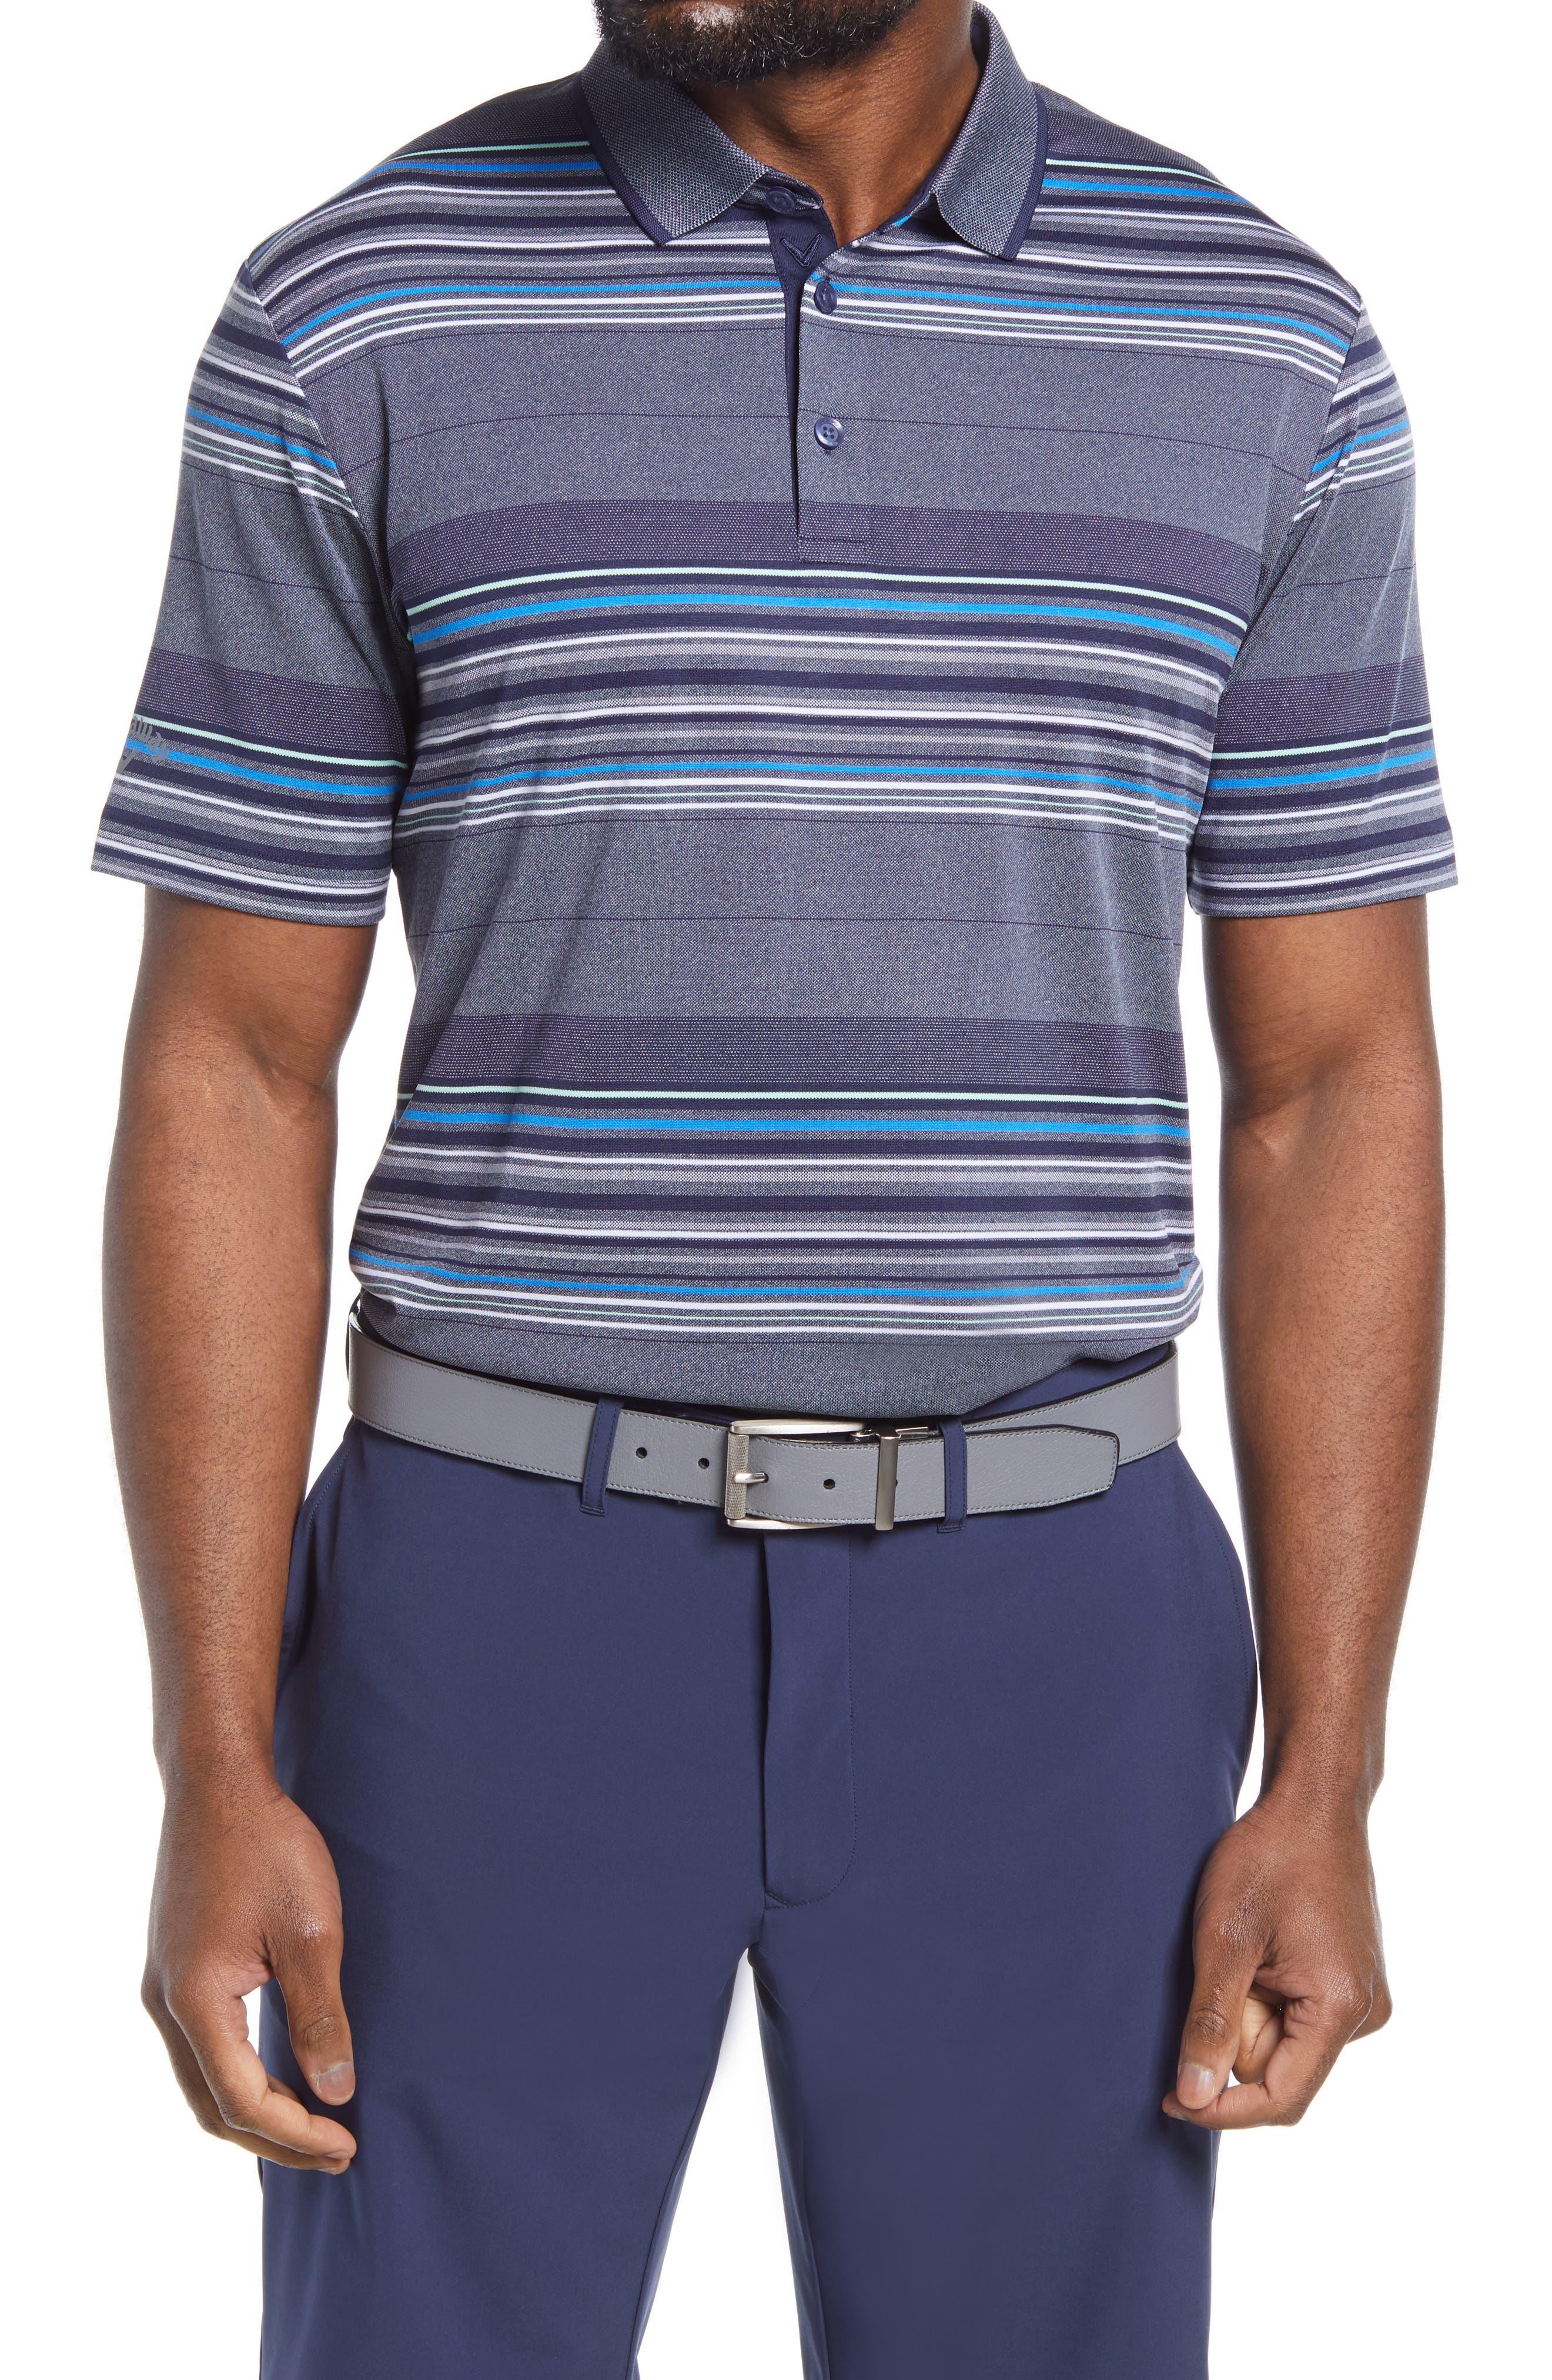 Men's Callaway Golf Swing Tech(TM) Oxford Stripe Performance Golf Polo